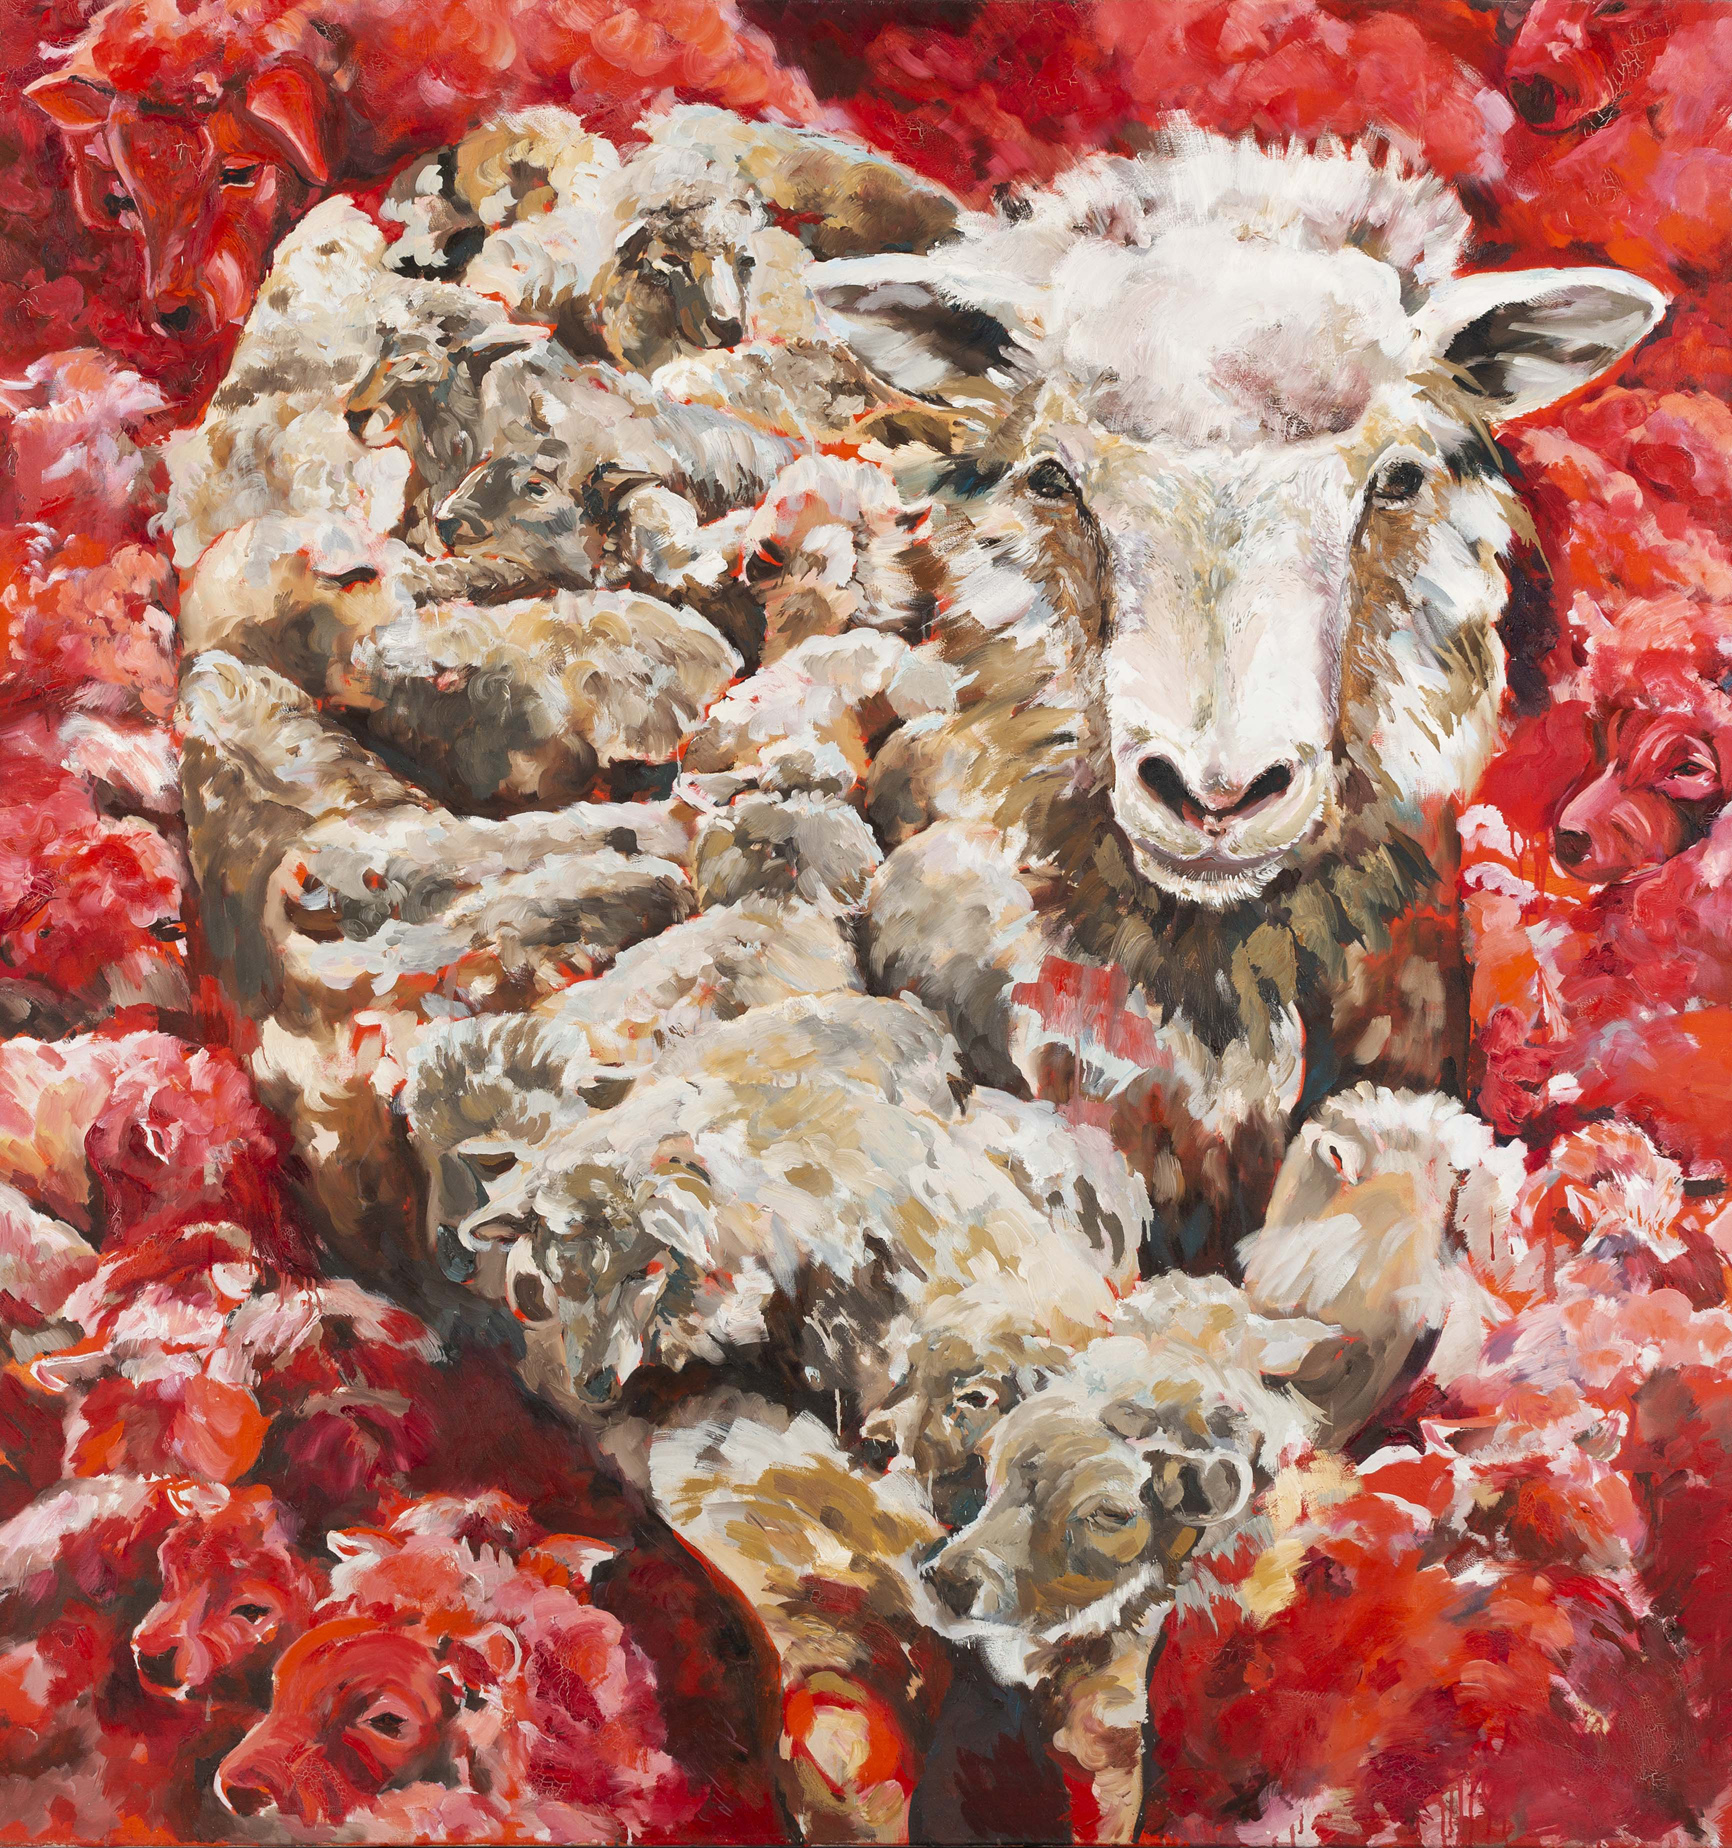 Krev a mléko/Blood and milk 2010